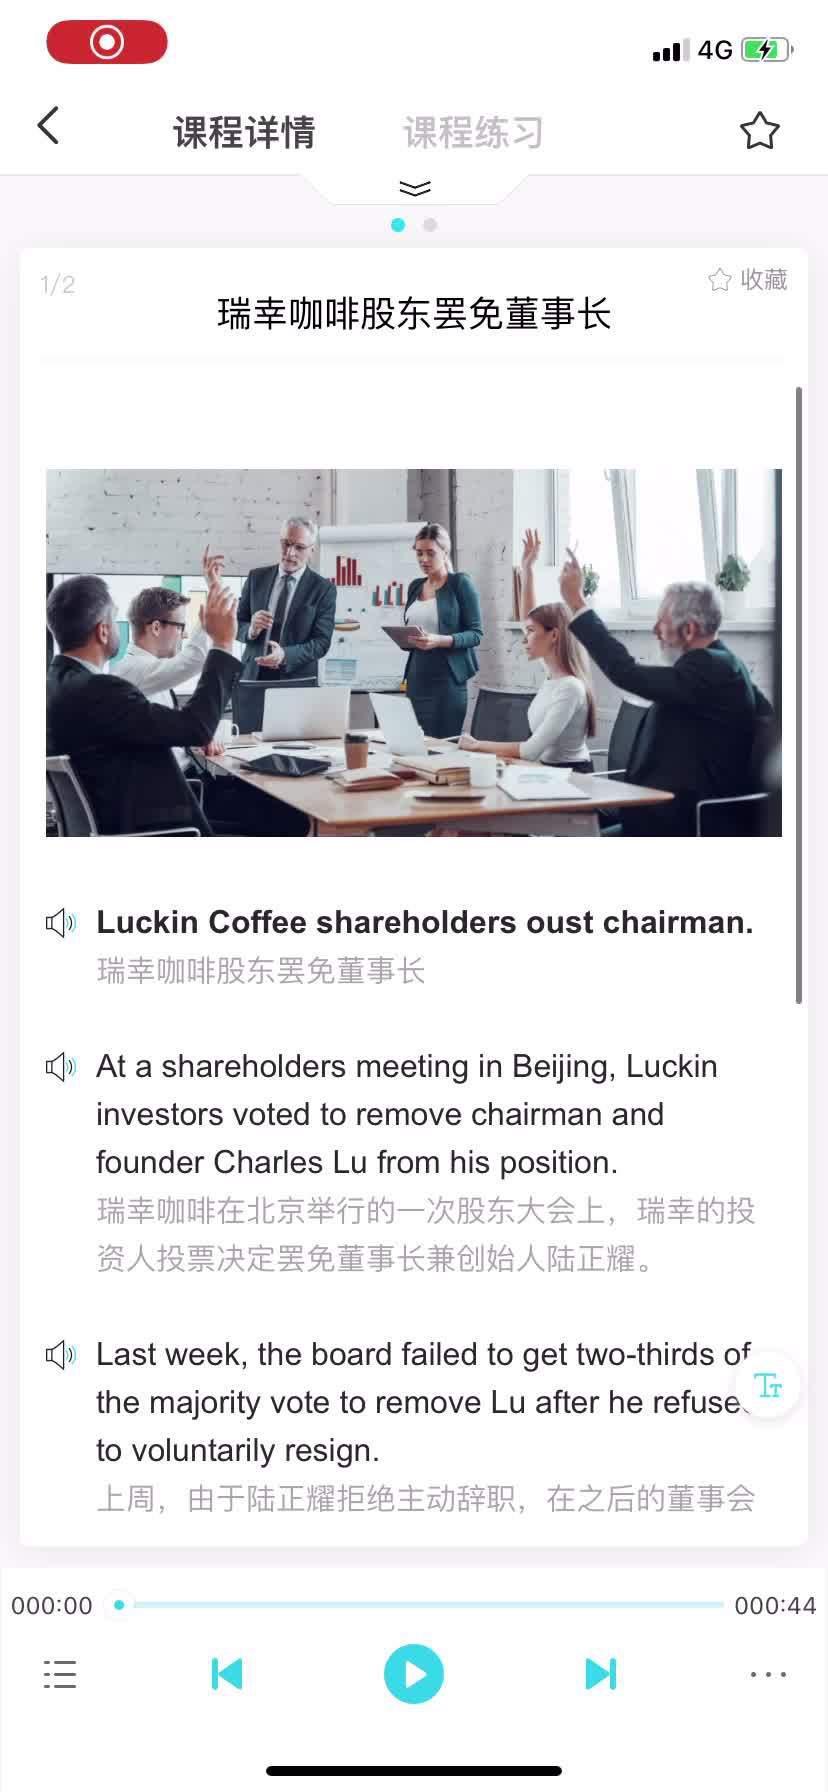 瑞幸咖啡股东罢免董事长 Luckin Coffee shareholders oust chair